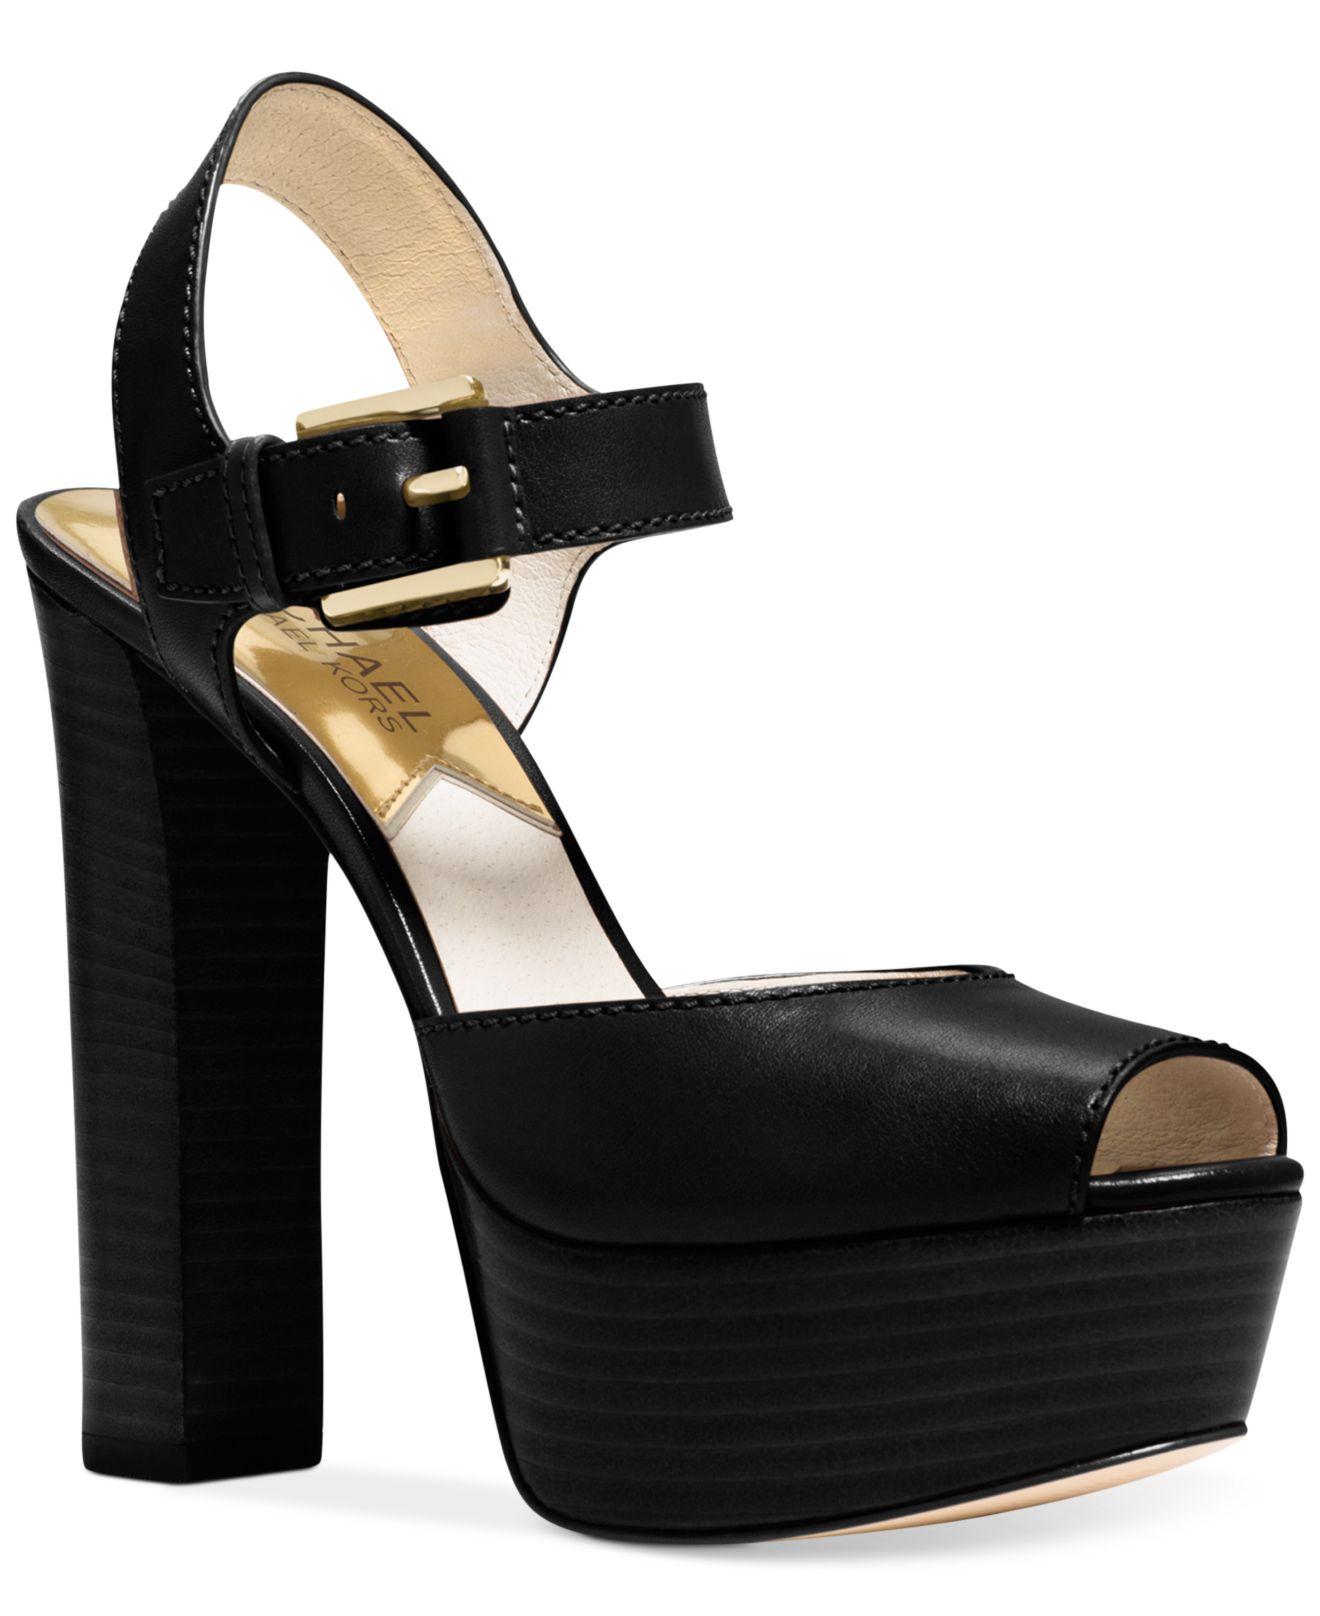 michael kors michael platform dress sandals in